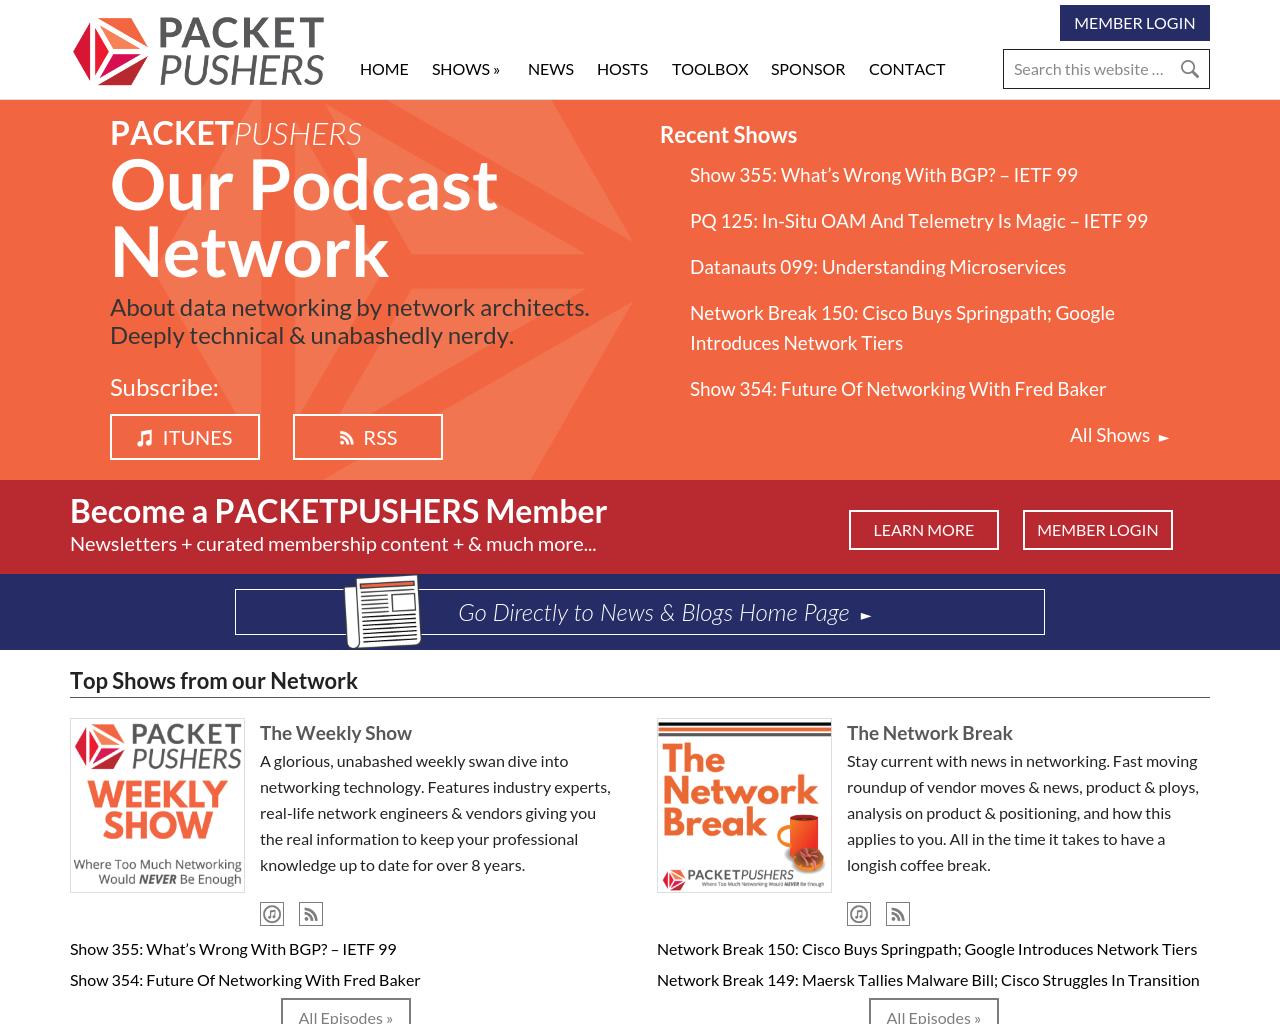 Packet-Pushers-Advertising-Reviews-Pricing